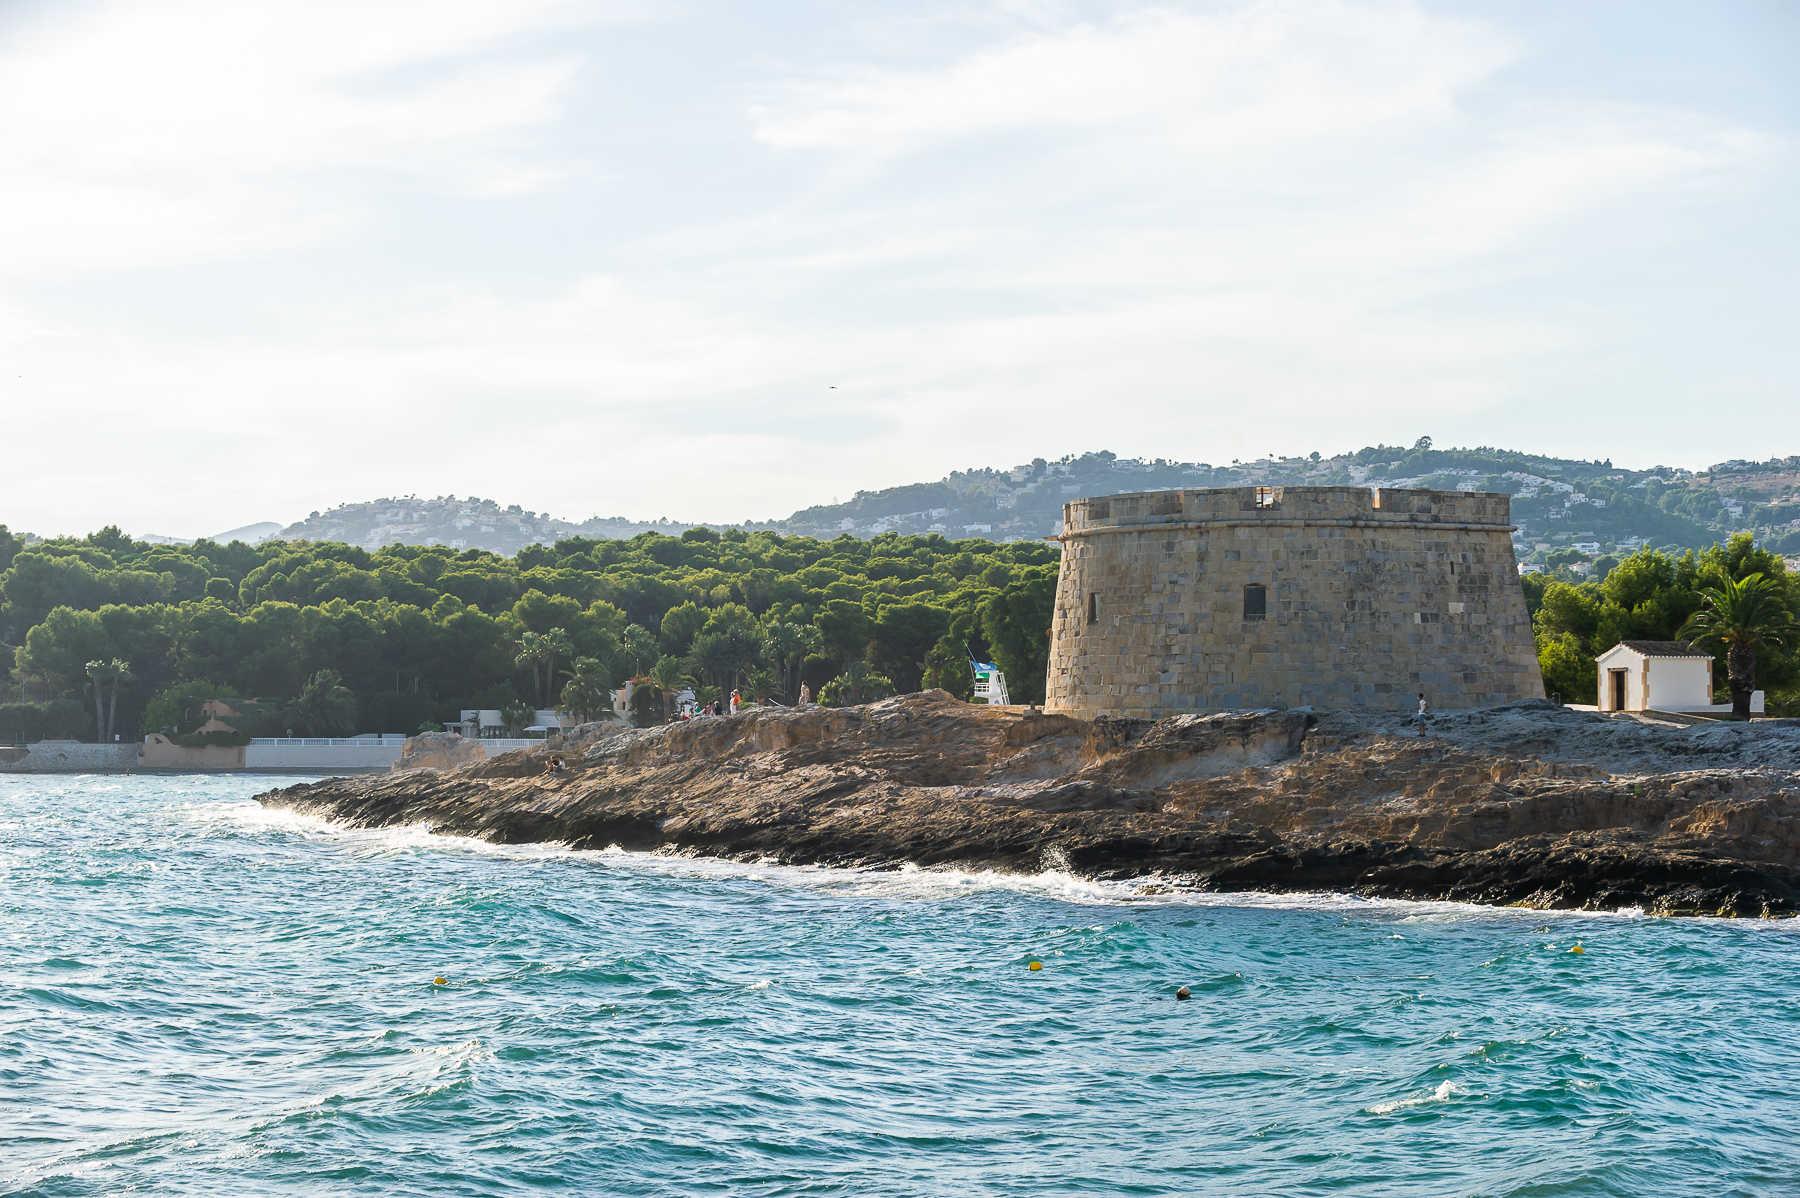 Teulada-Moraira Castle